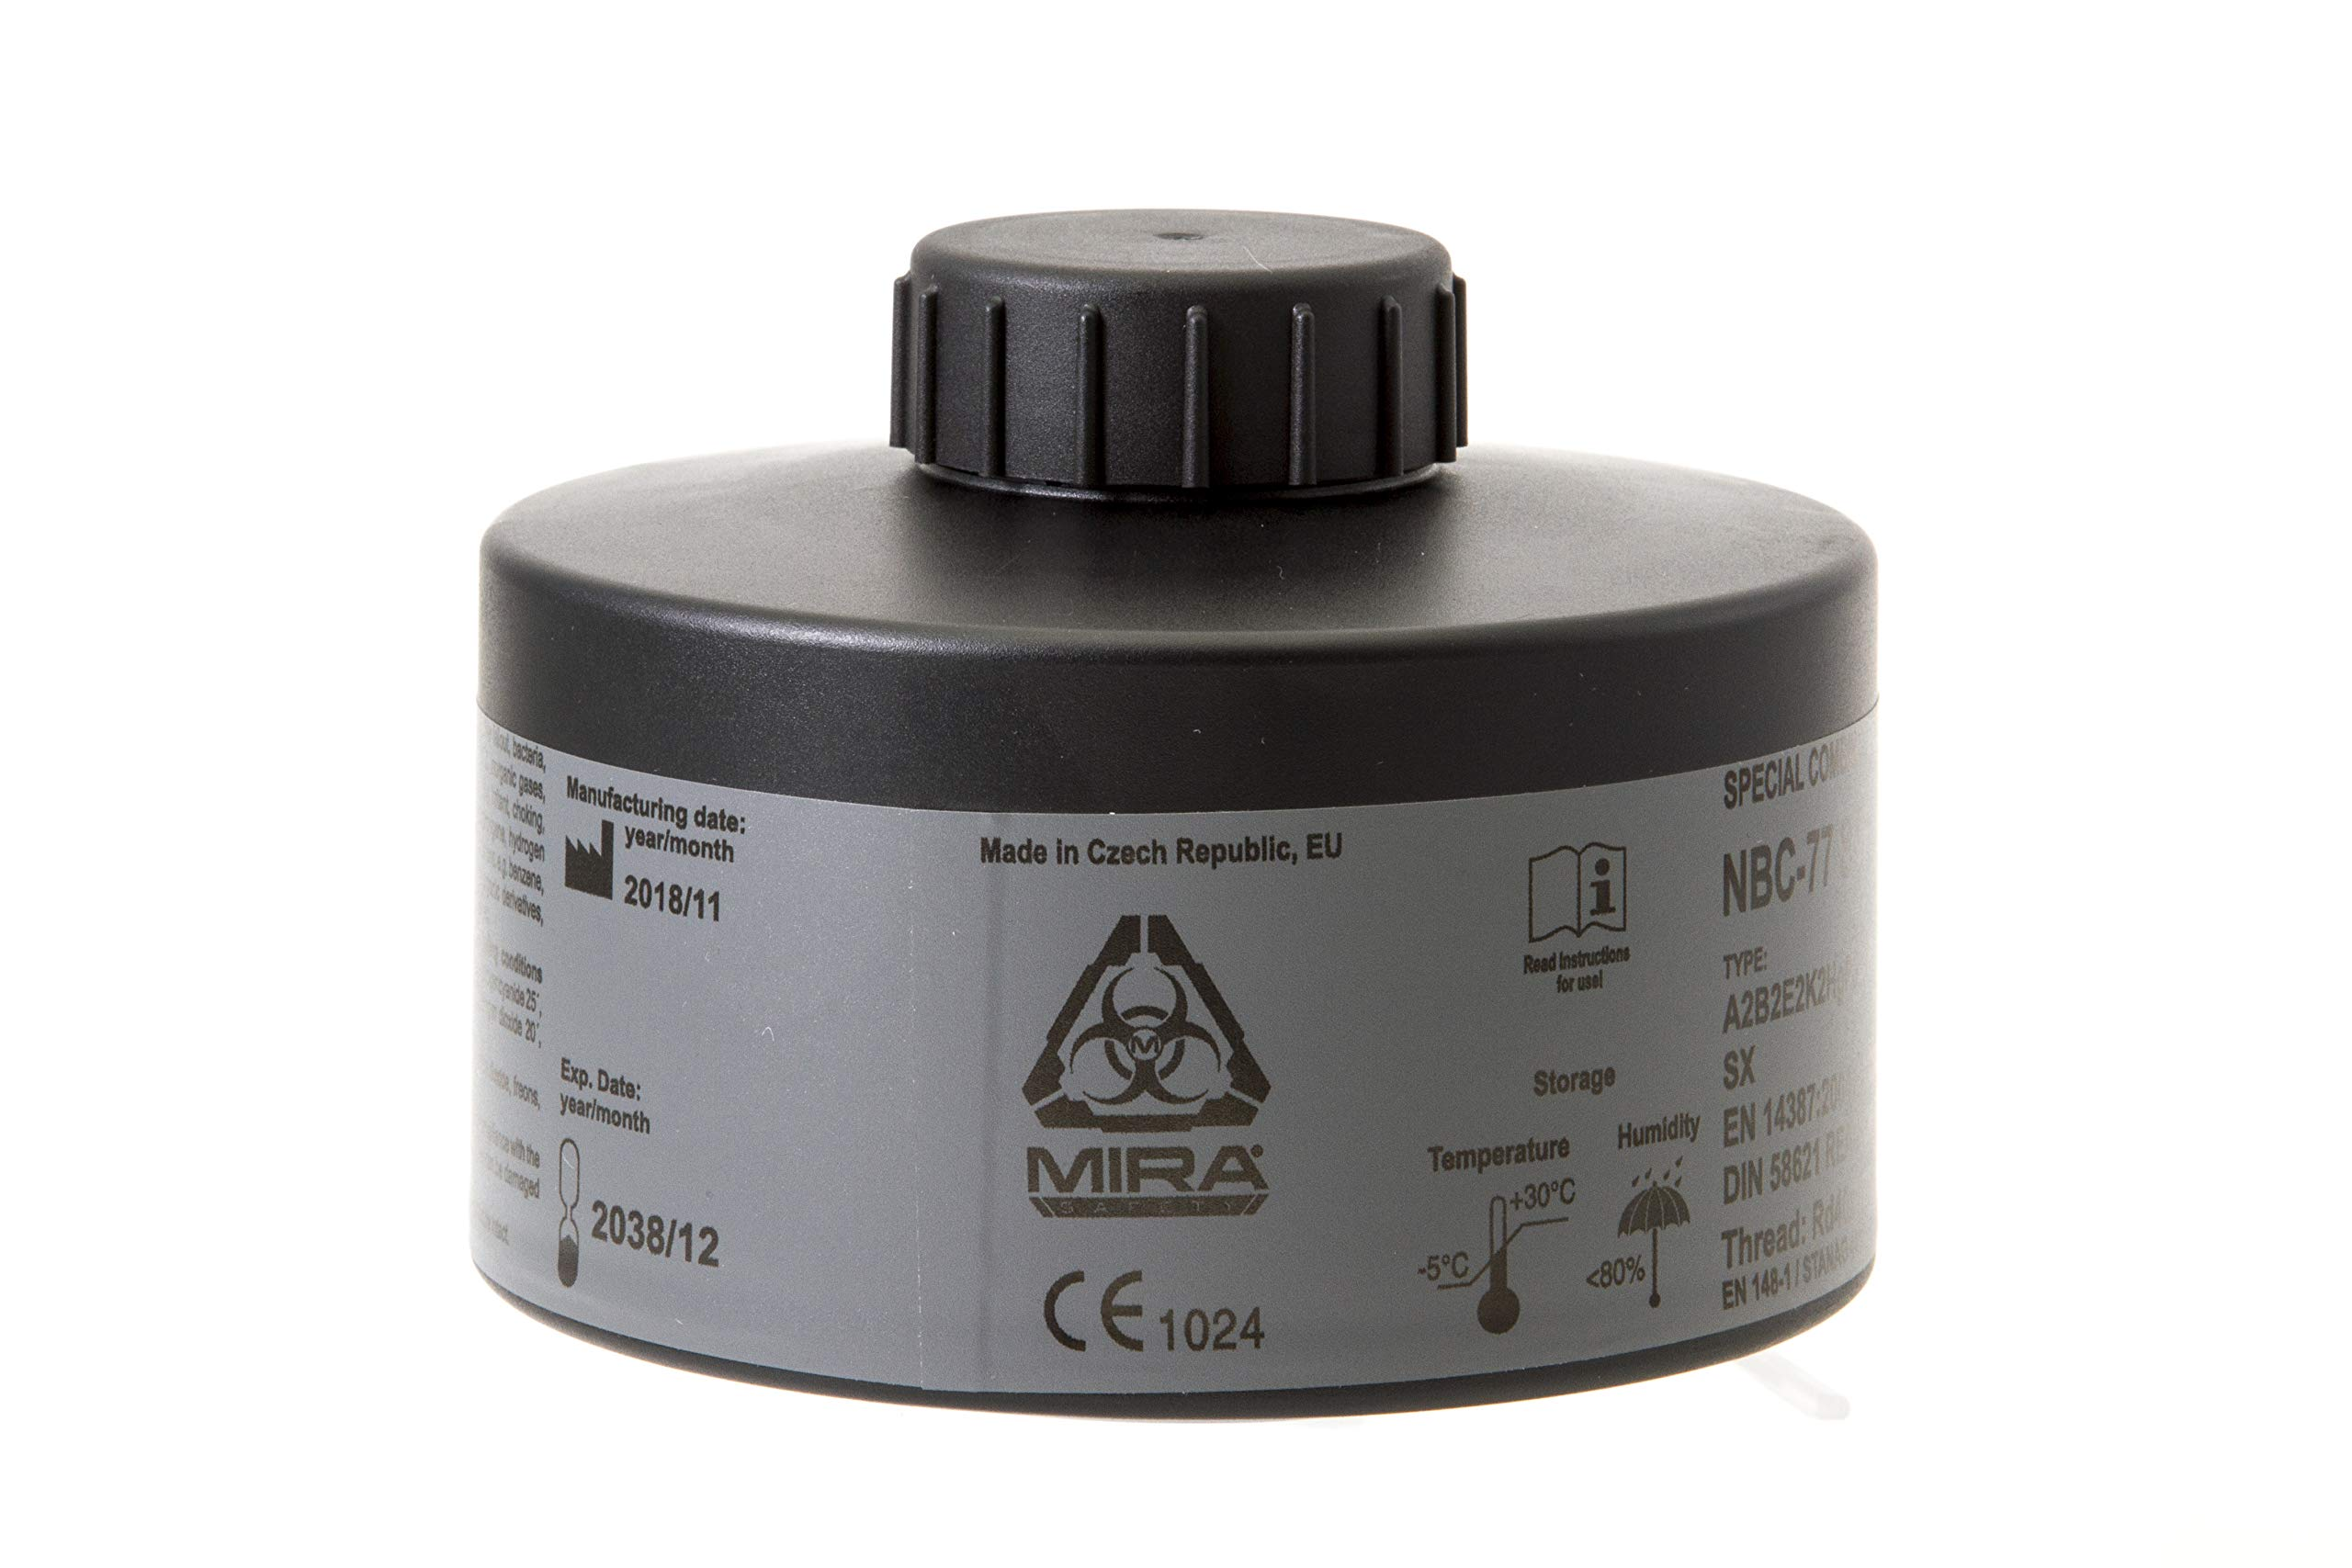 MIRA Multi Gas Vapor Cartridge Respiratory Protection 20 Years Shelf Life CBRN NBC Grade (Mira Filter) by MIRA SAFETY M (Image #1)